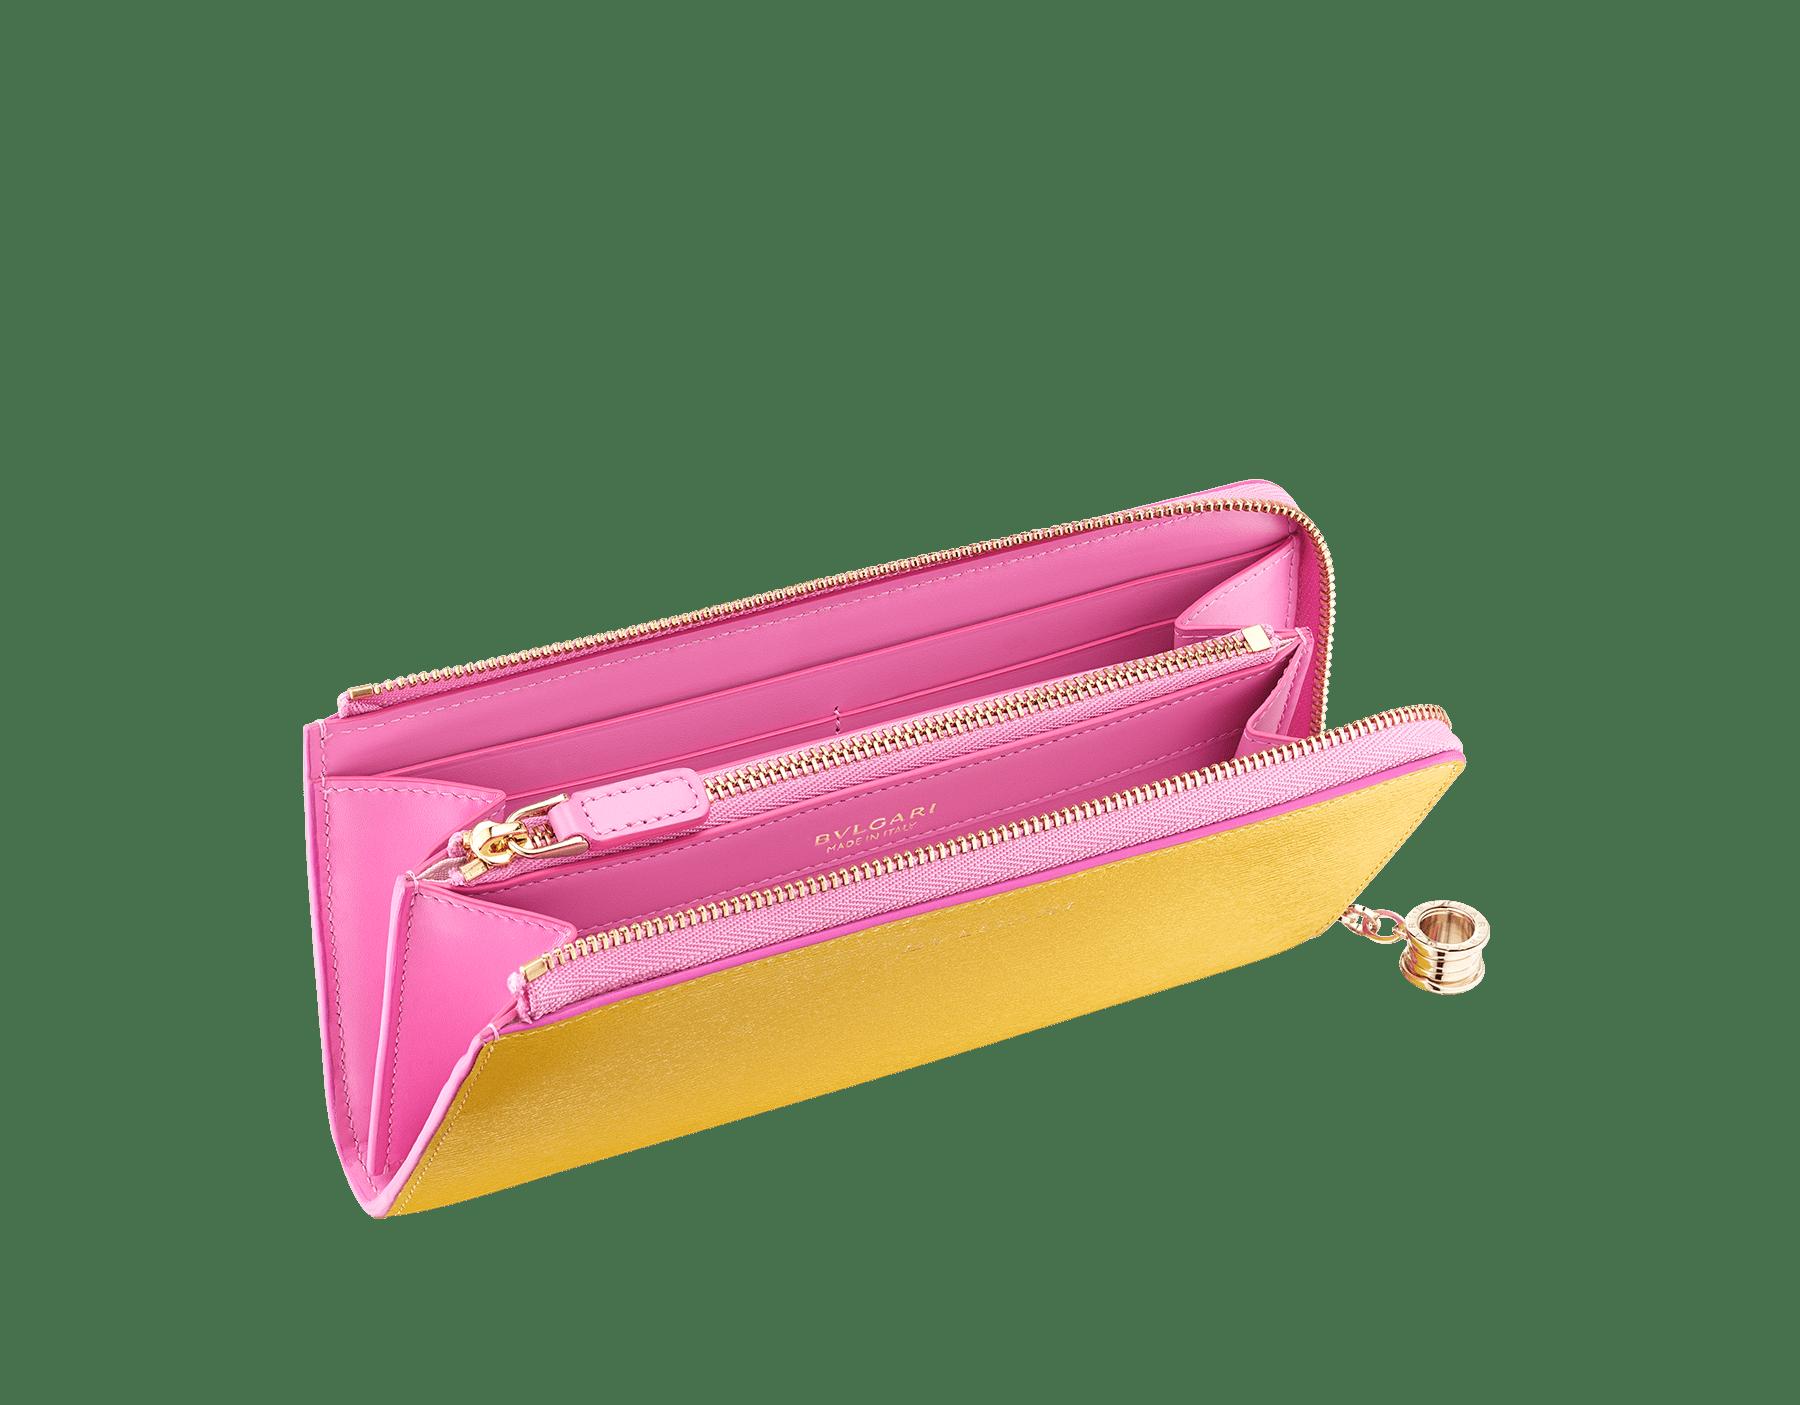 B.zero1 L-shaped zipped wallet in daisy topaz, taffy quartz goatskin and taffy quartz nappa. Iconic B.zero1 zip puller in light gold-plated brass. BZA-WLT-MZP-SLIM-L image 2